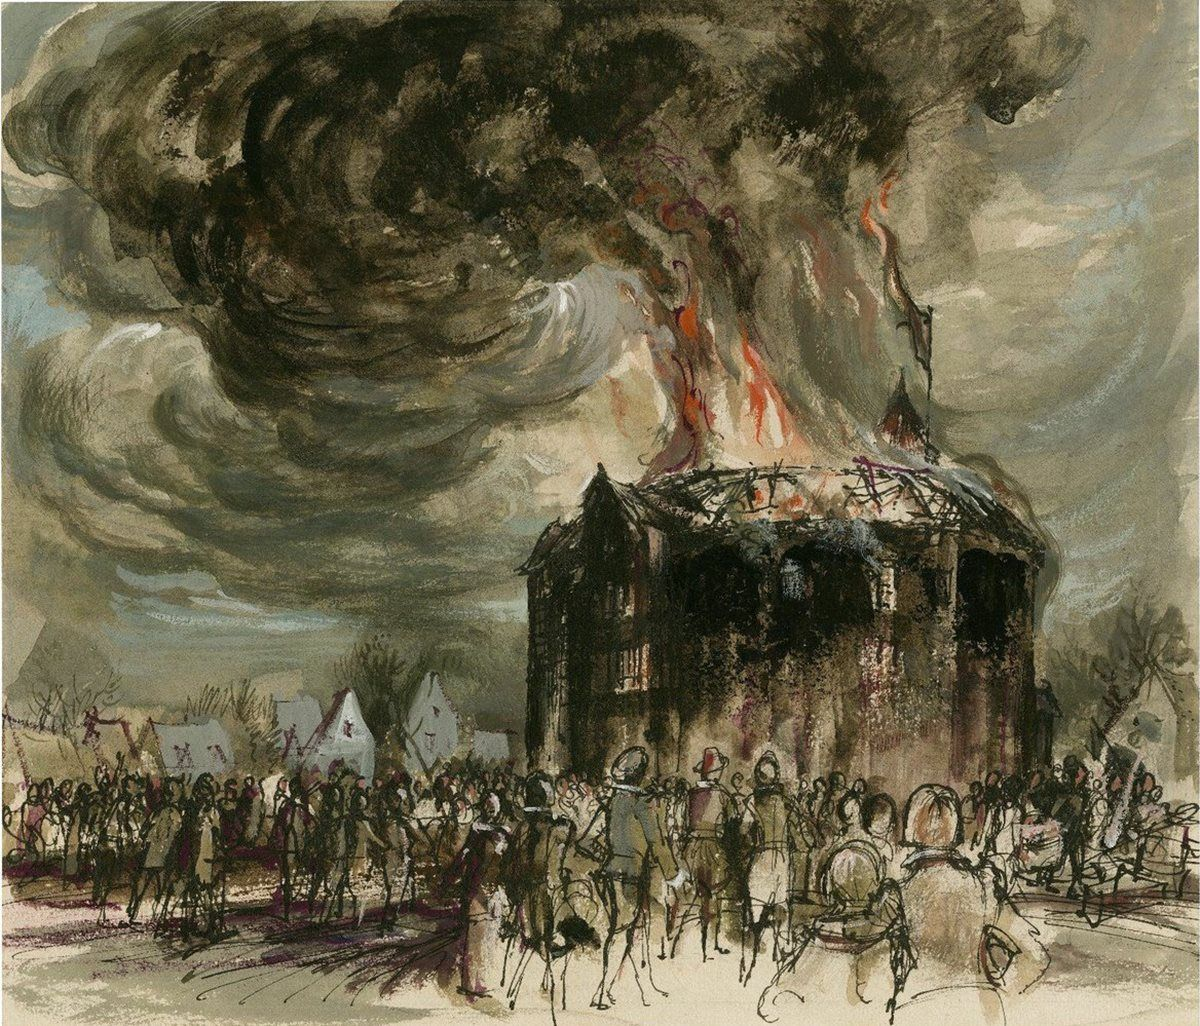 globe-theatre-burns-down